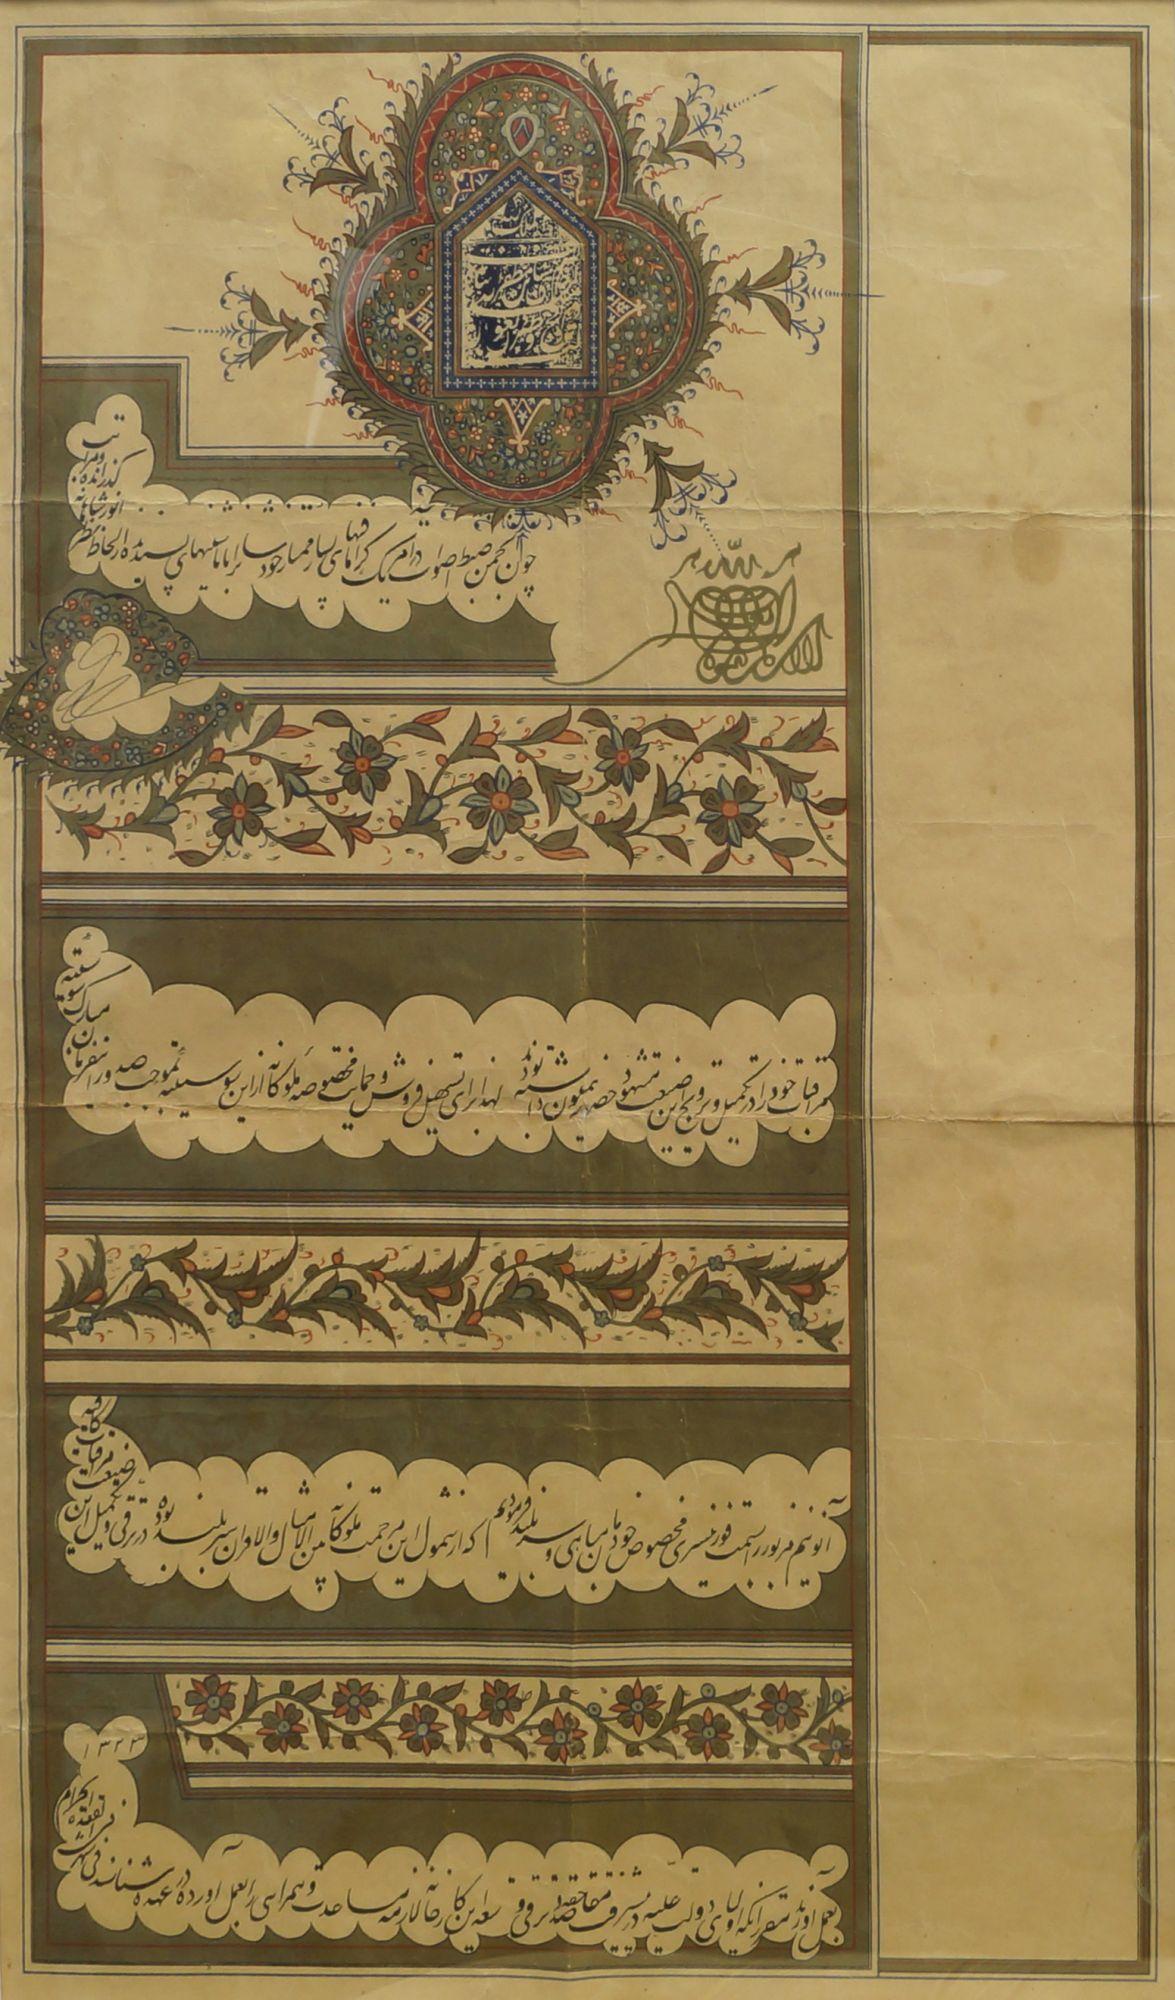 Lot 102 - An unusual printed copy of an edict of Muzaffar al-Din Shah (reg. 1896-1907) giving permission for